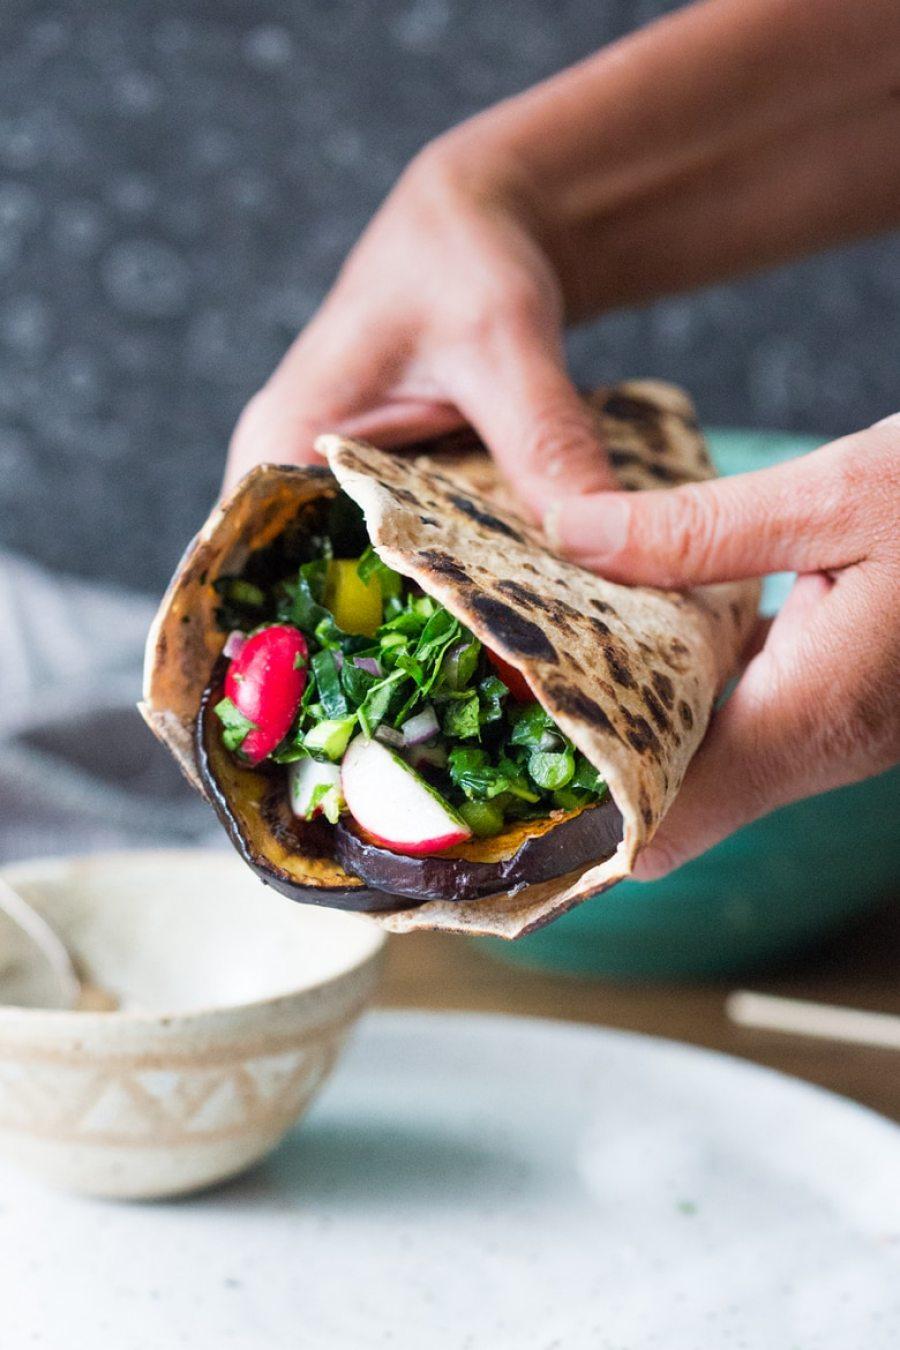 Middle Eastern Eggplant Wrap with a lemony Kale Parsley Mint Slaw with Creamy Tahini Sauce. Keep it vegan or add feta!   www.feastingathome.com